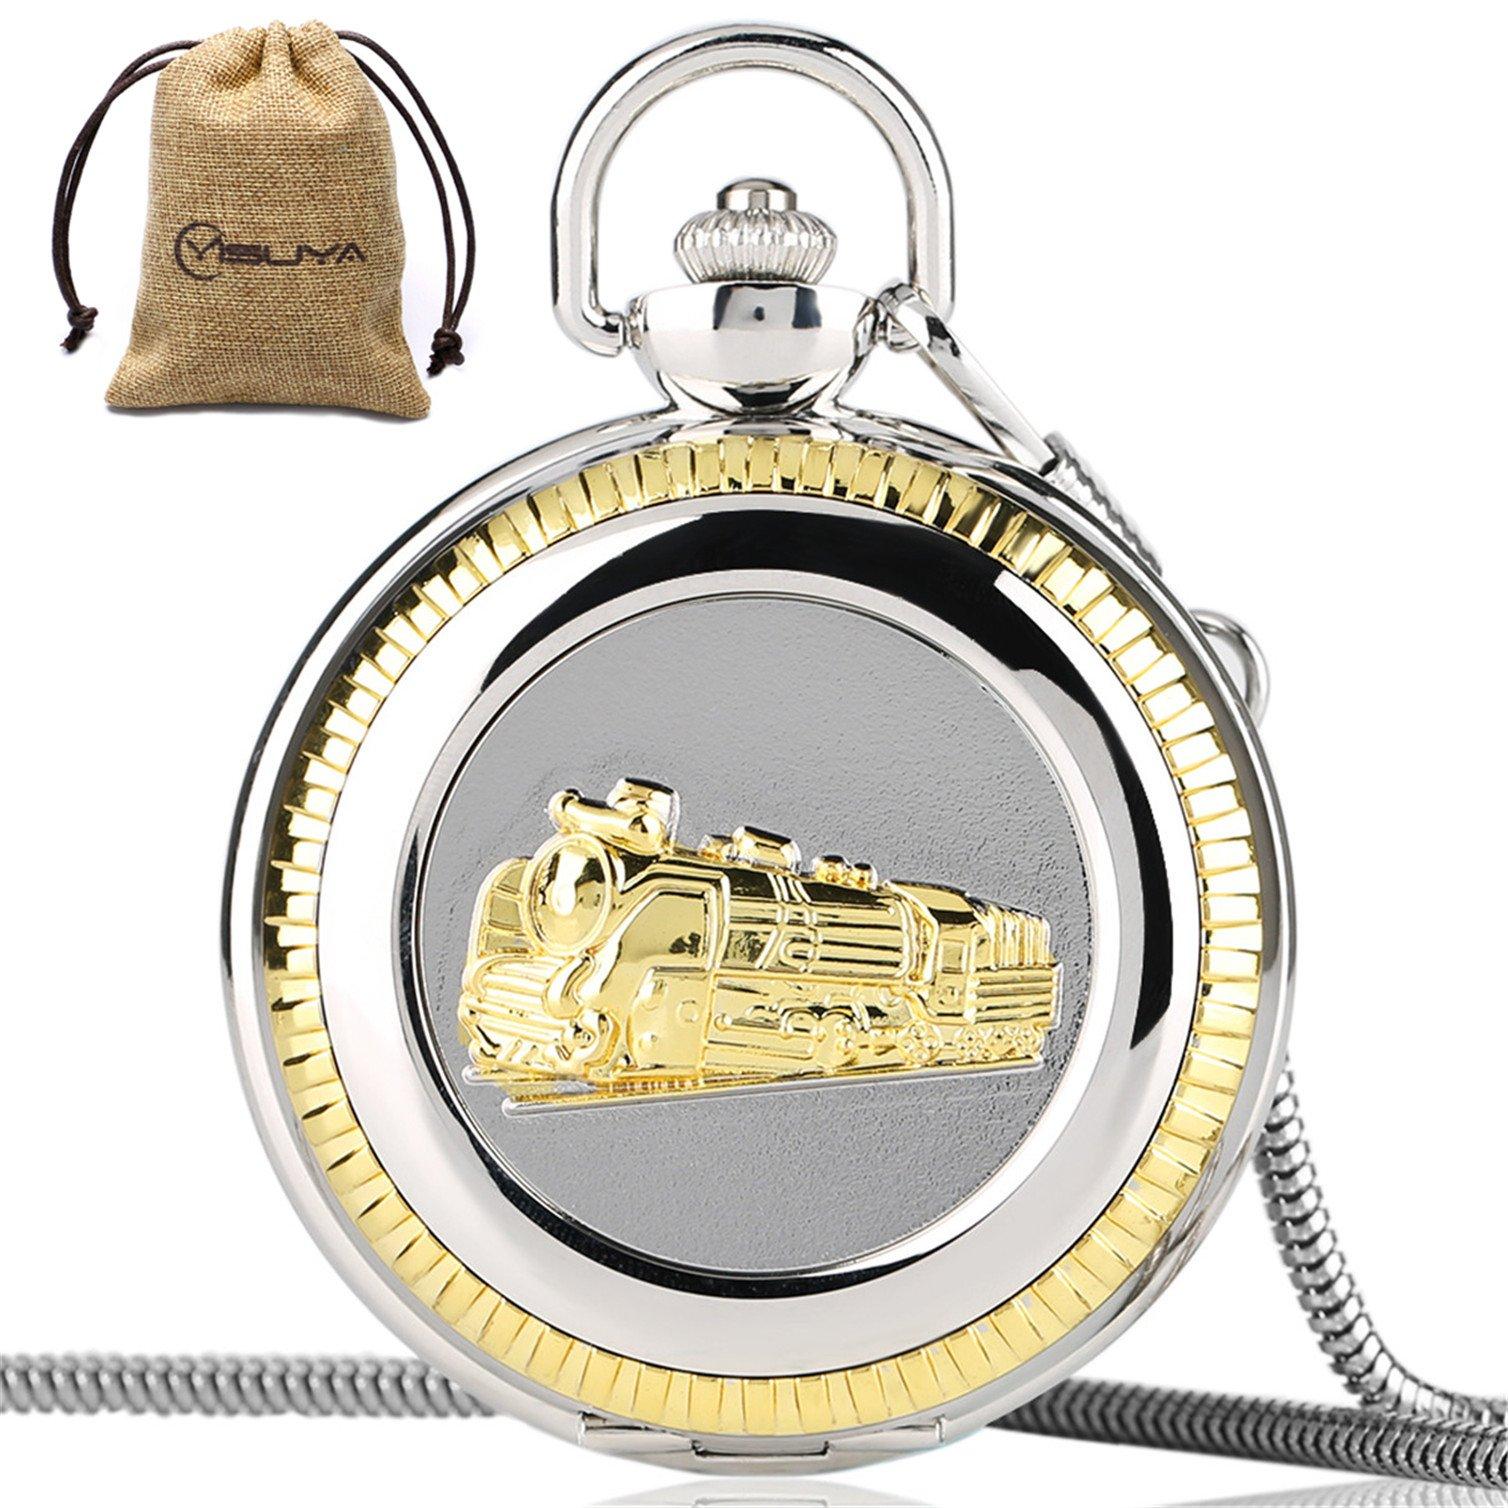 Vintage Train Railroad Conductor's Locomotive Quartz Pocket Watch Roman Numberal with Chain